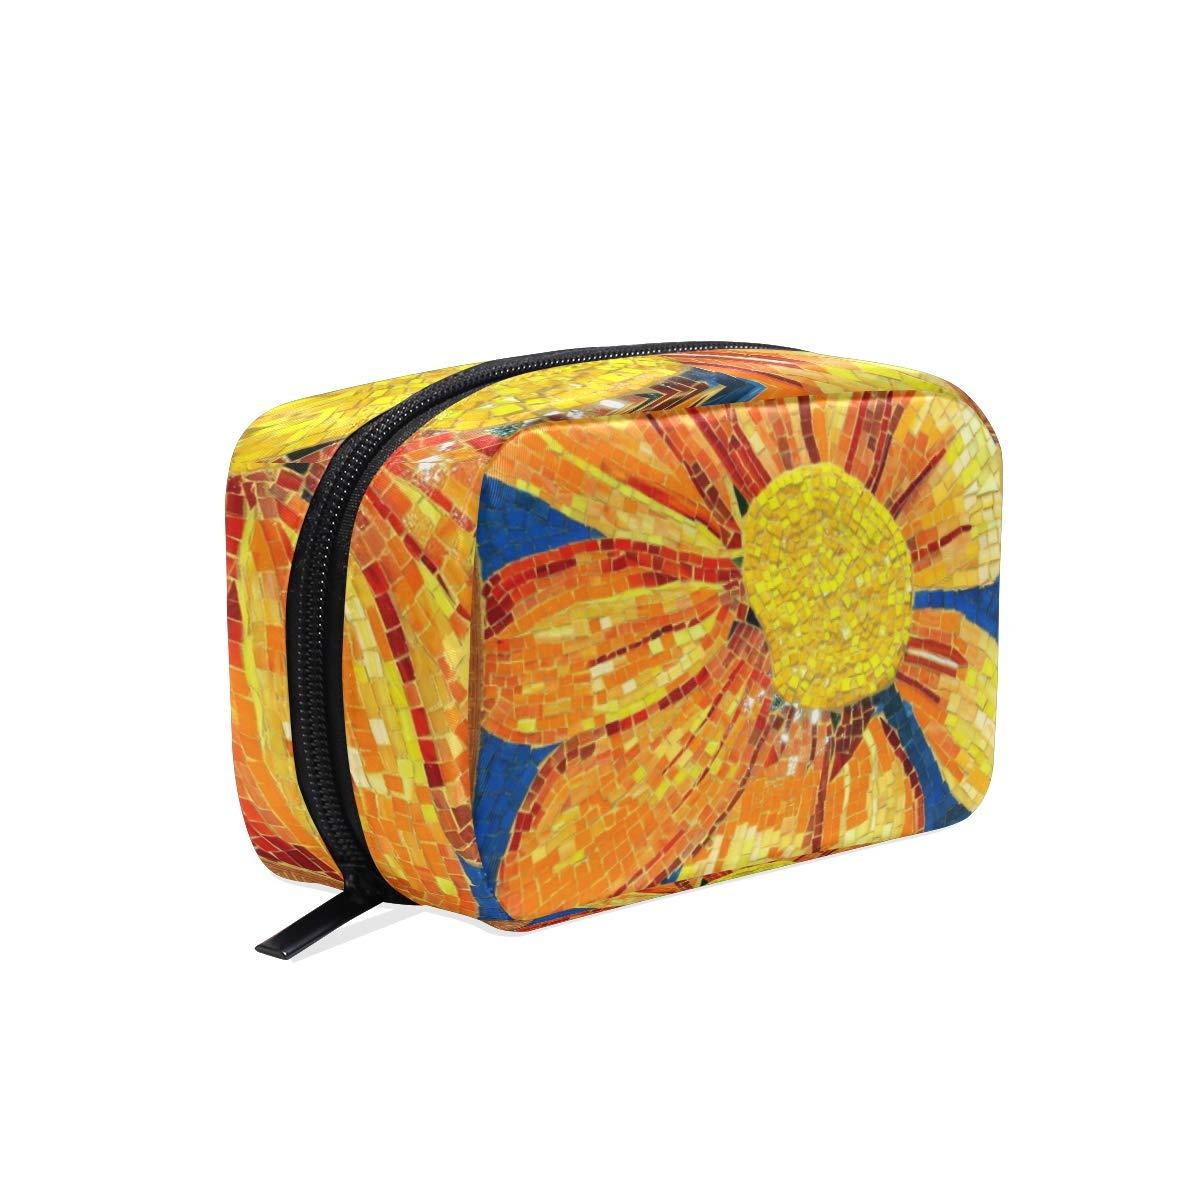 486e734c5f08 Amazon.com : Cosmetic Bag Sunflower Mosaic Pattern Customized Makeup ...